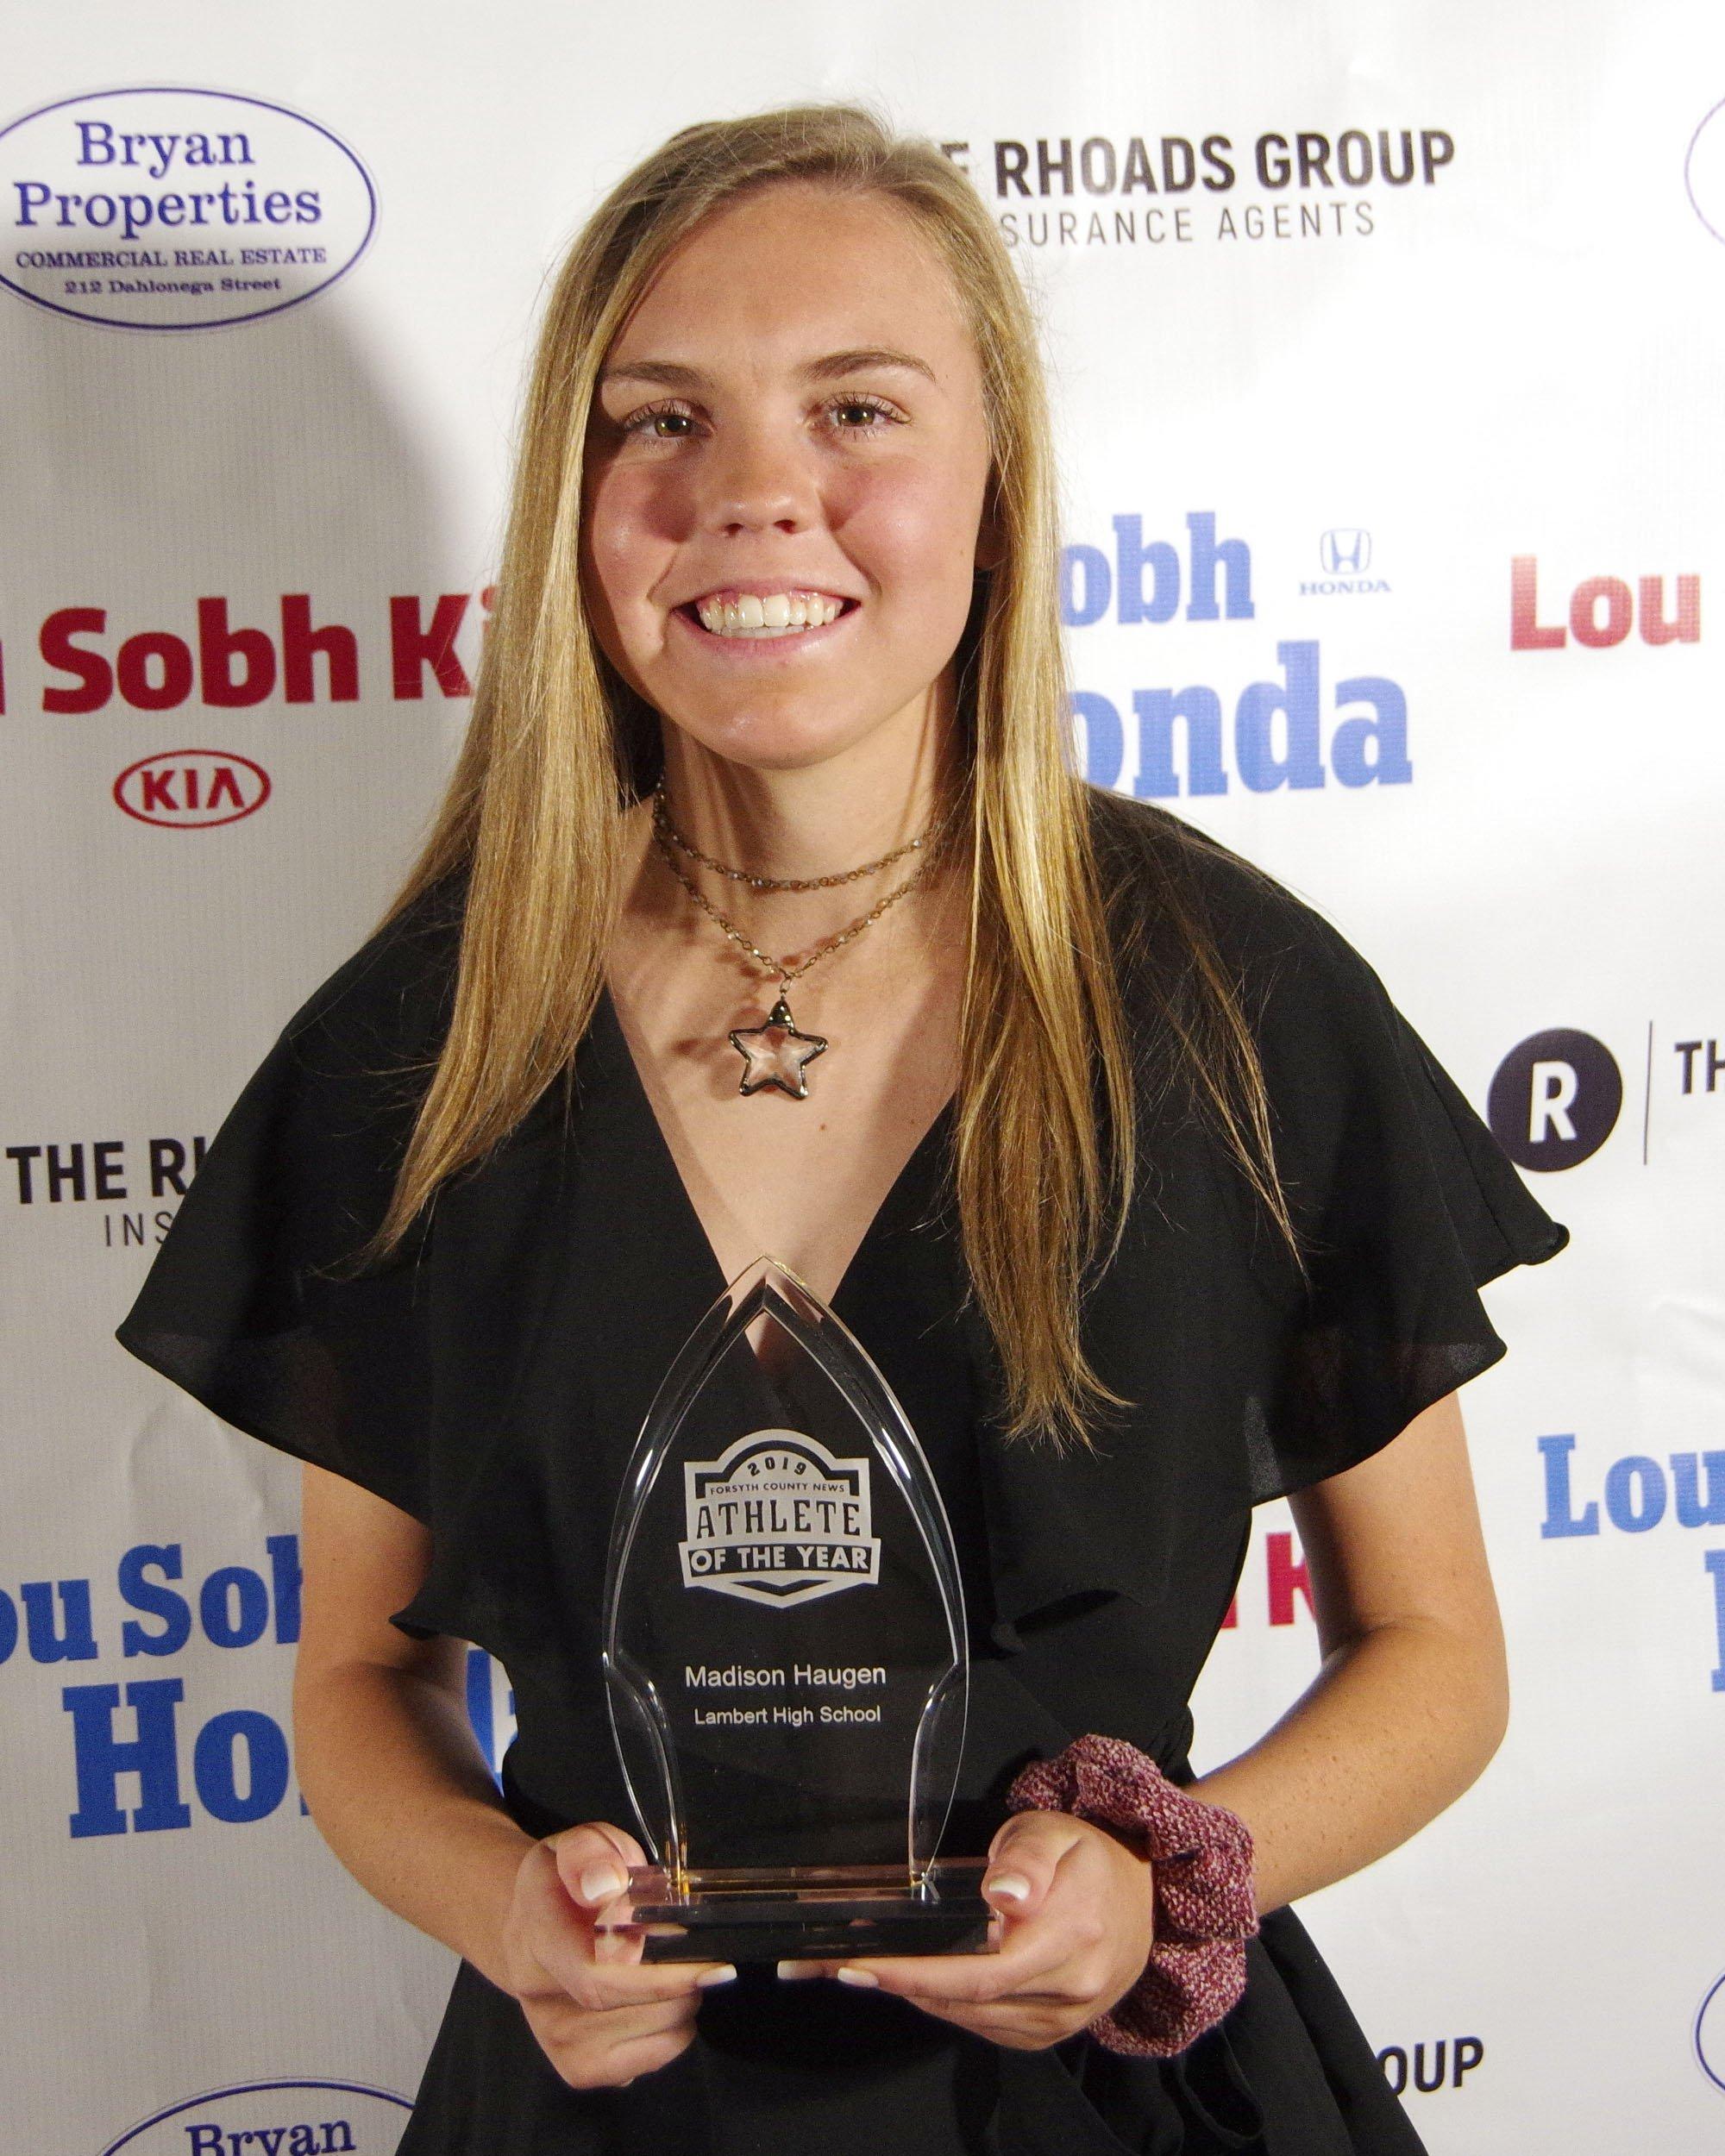 Madison Haugen Athlete of the Year